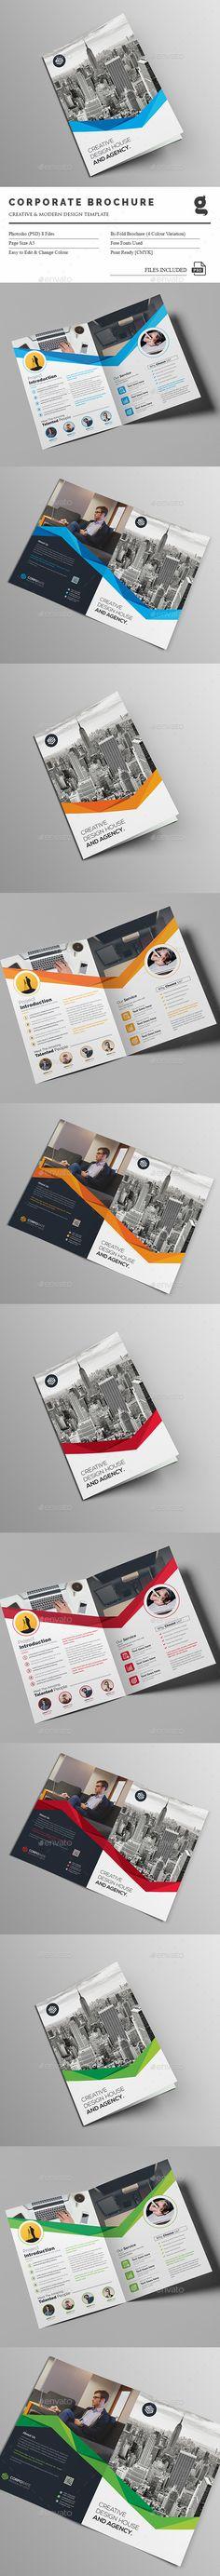 Bi-Fold Business Brochure Template PSD. Download here: http://graphicriver.net/item/bifold-business-brochure/14596292?ref=ksioks